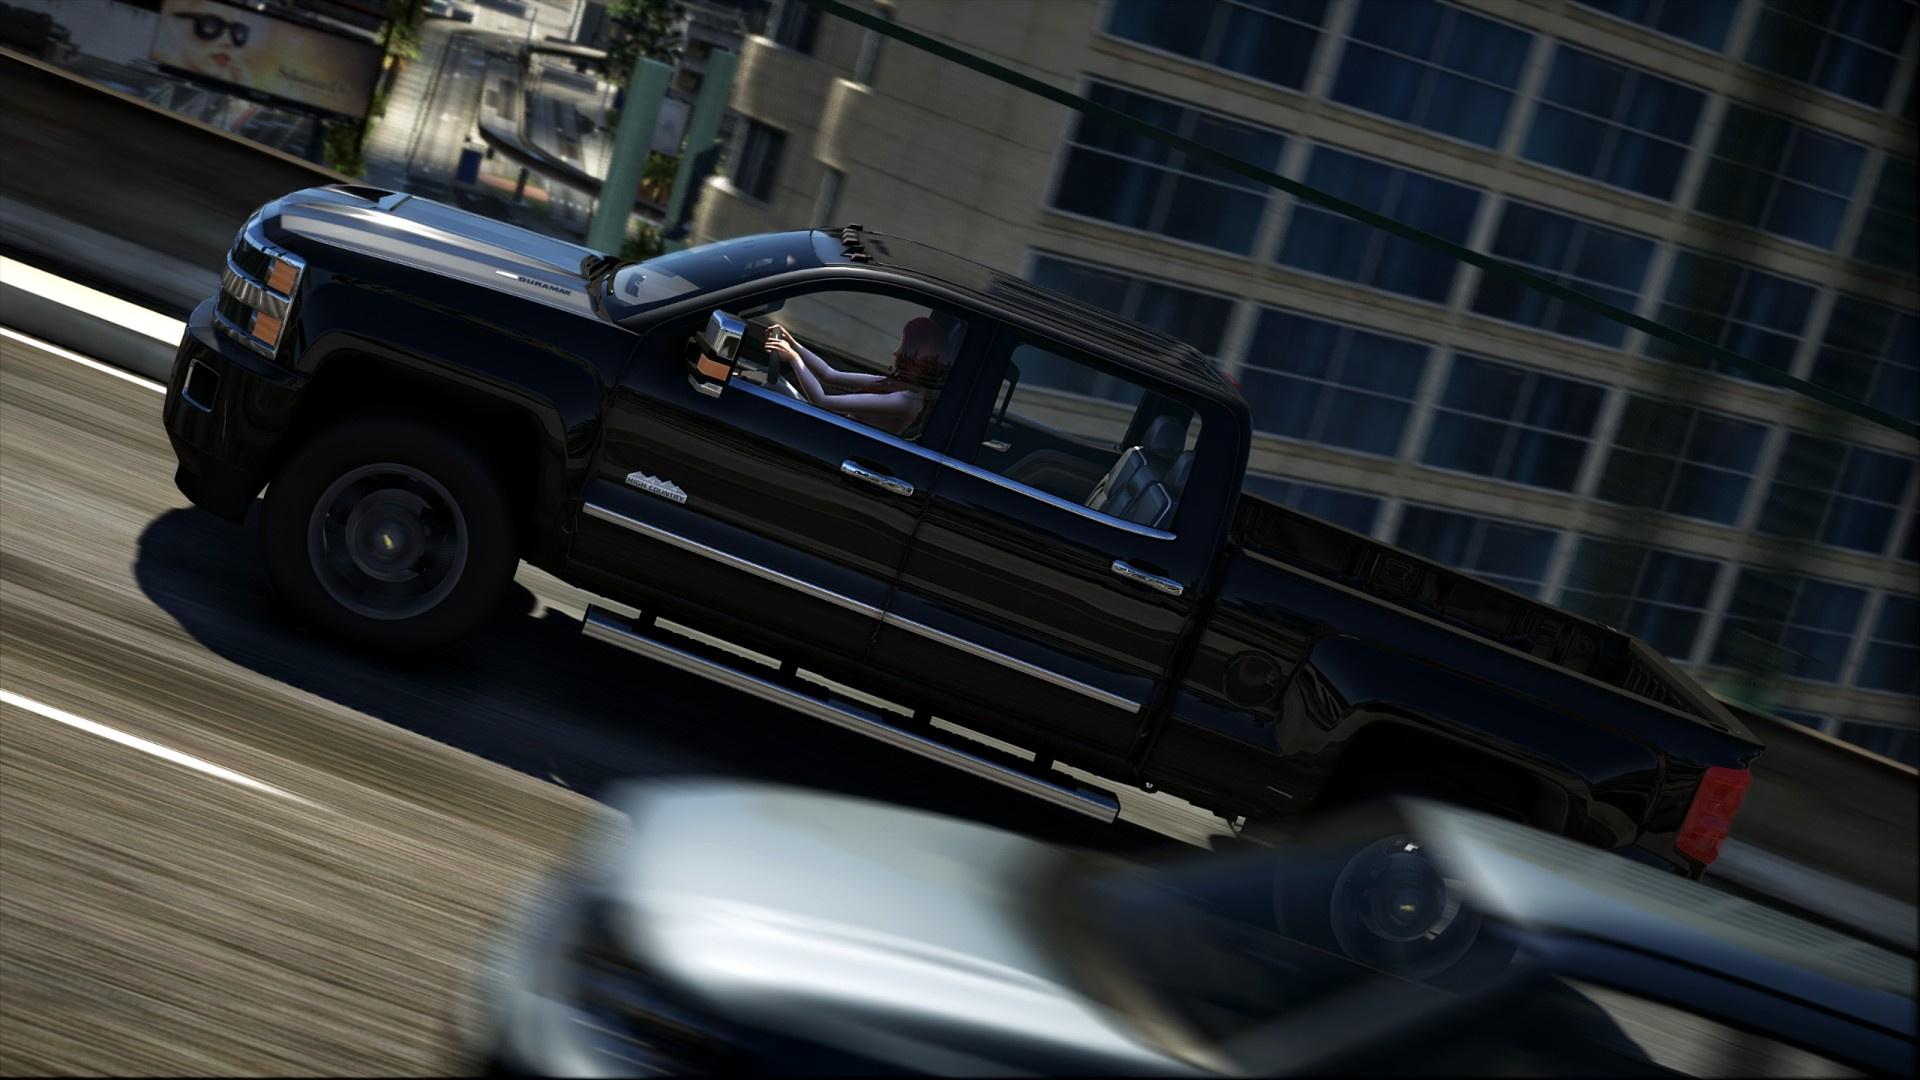 Chevrolet Silverado 2500 Heavy Duty 2017 [Add ] GTA5 Mods